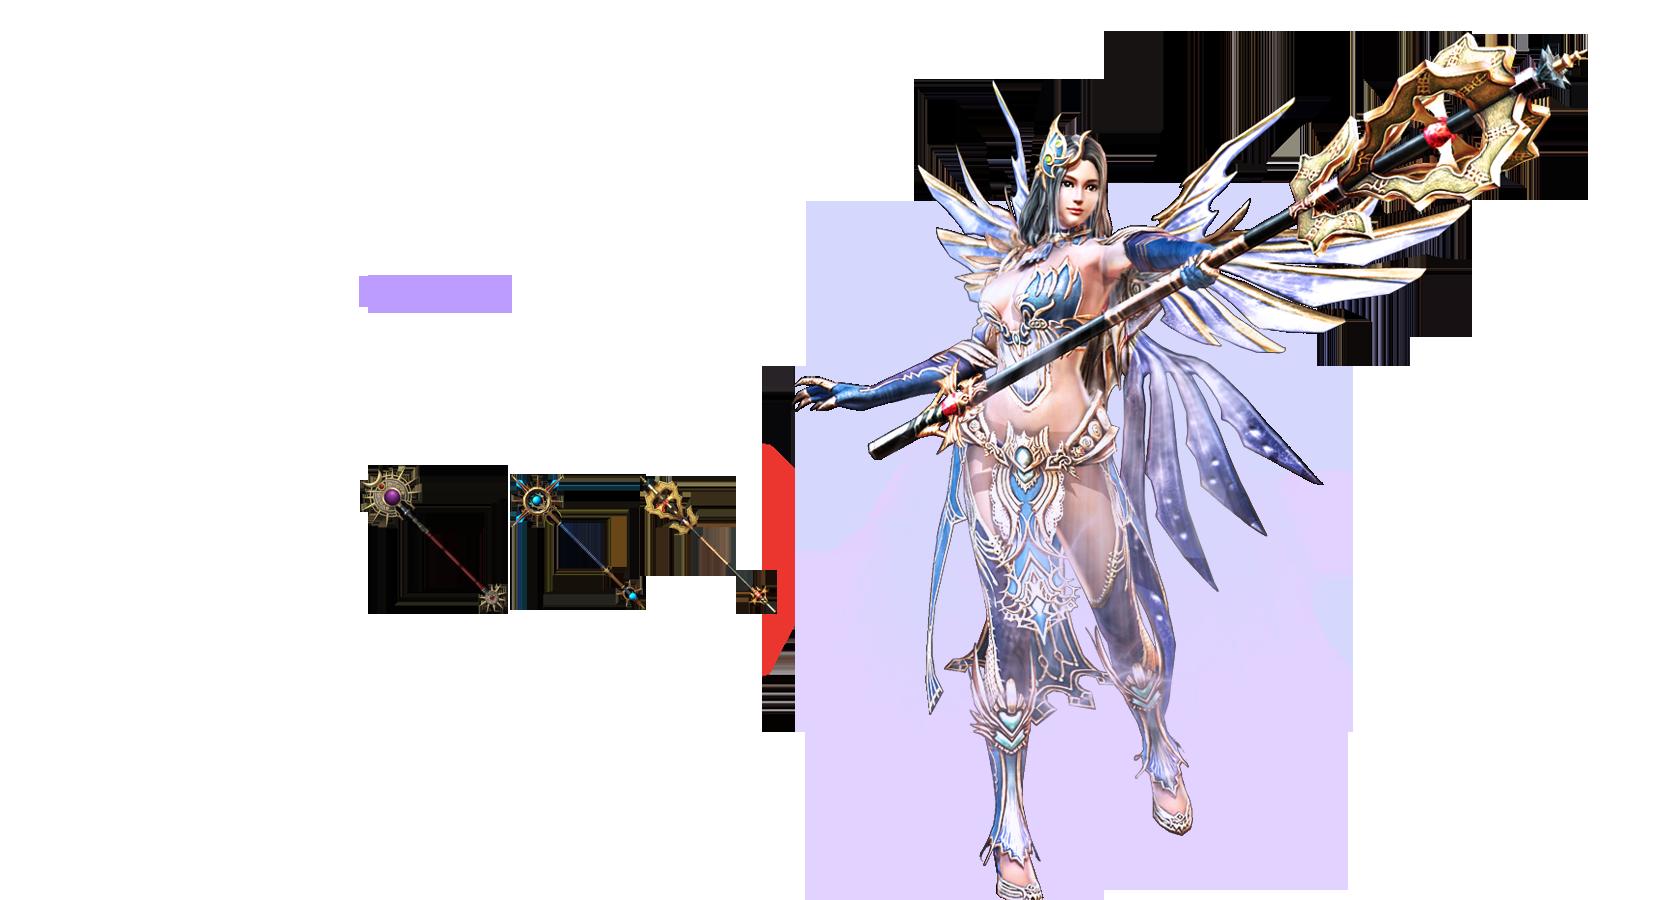 Wizard 강력한 주문으로 세상을 지배한다. 많은 적을 상대할 수록 그 어떤 무기보다 강력한 파괴력을 자랑한다. 그녀의 마법은 적들에게는 두려움을 넘은 공포였다. 다양한 범위 마법과 강력한 체인 마법으로 넓은 범위의 공격이 가능하다.